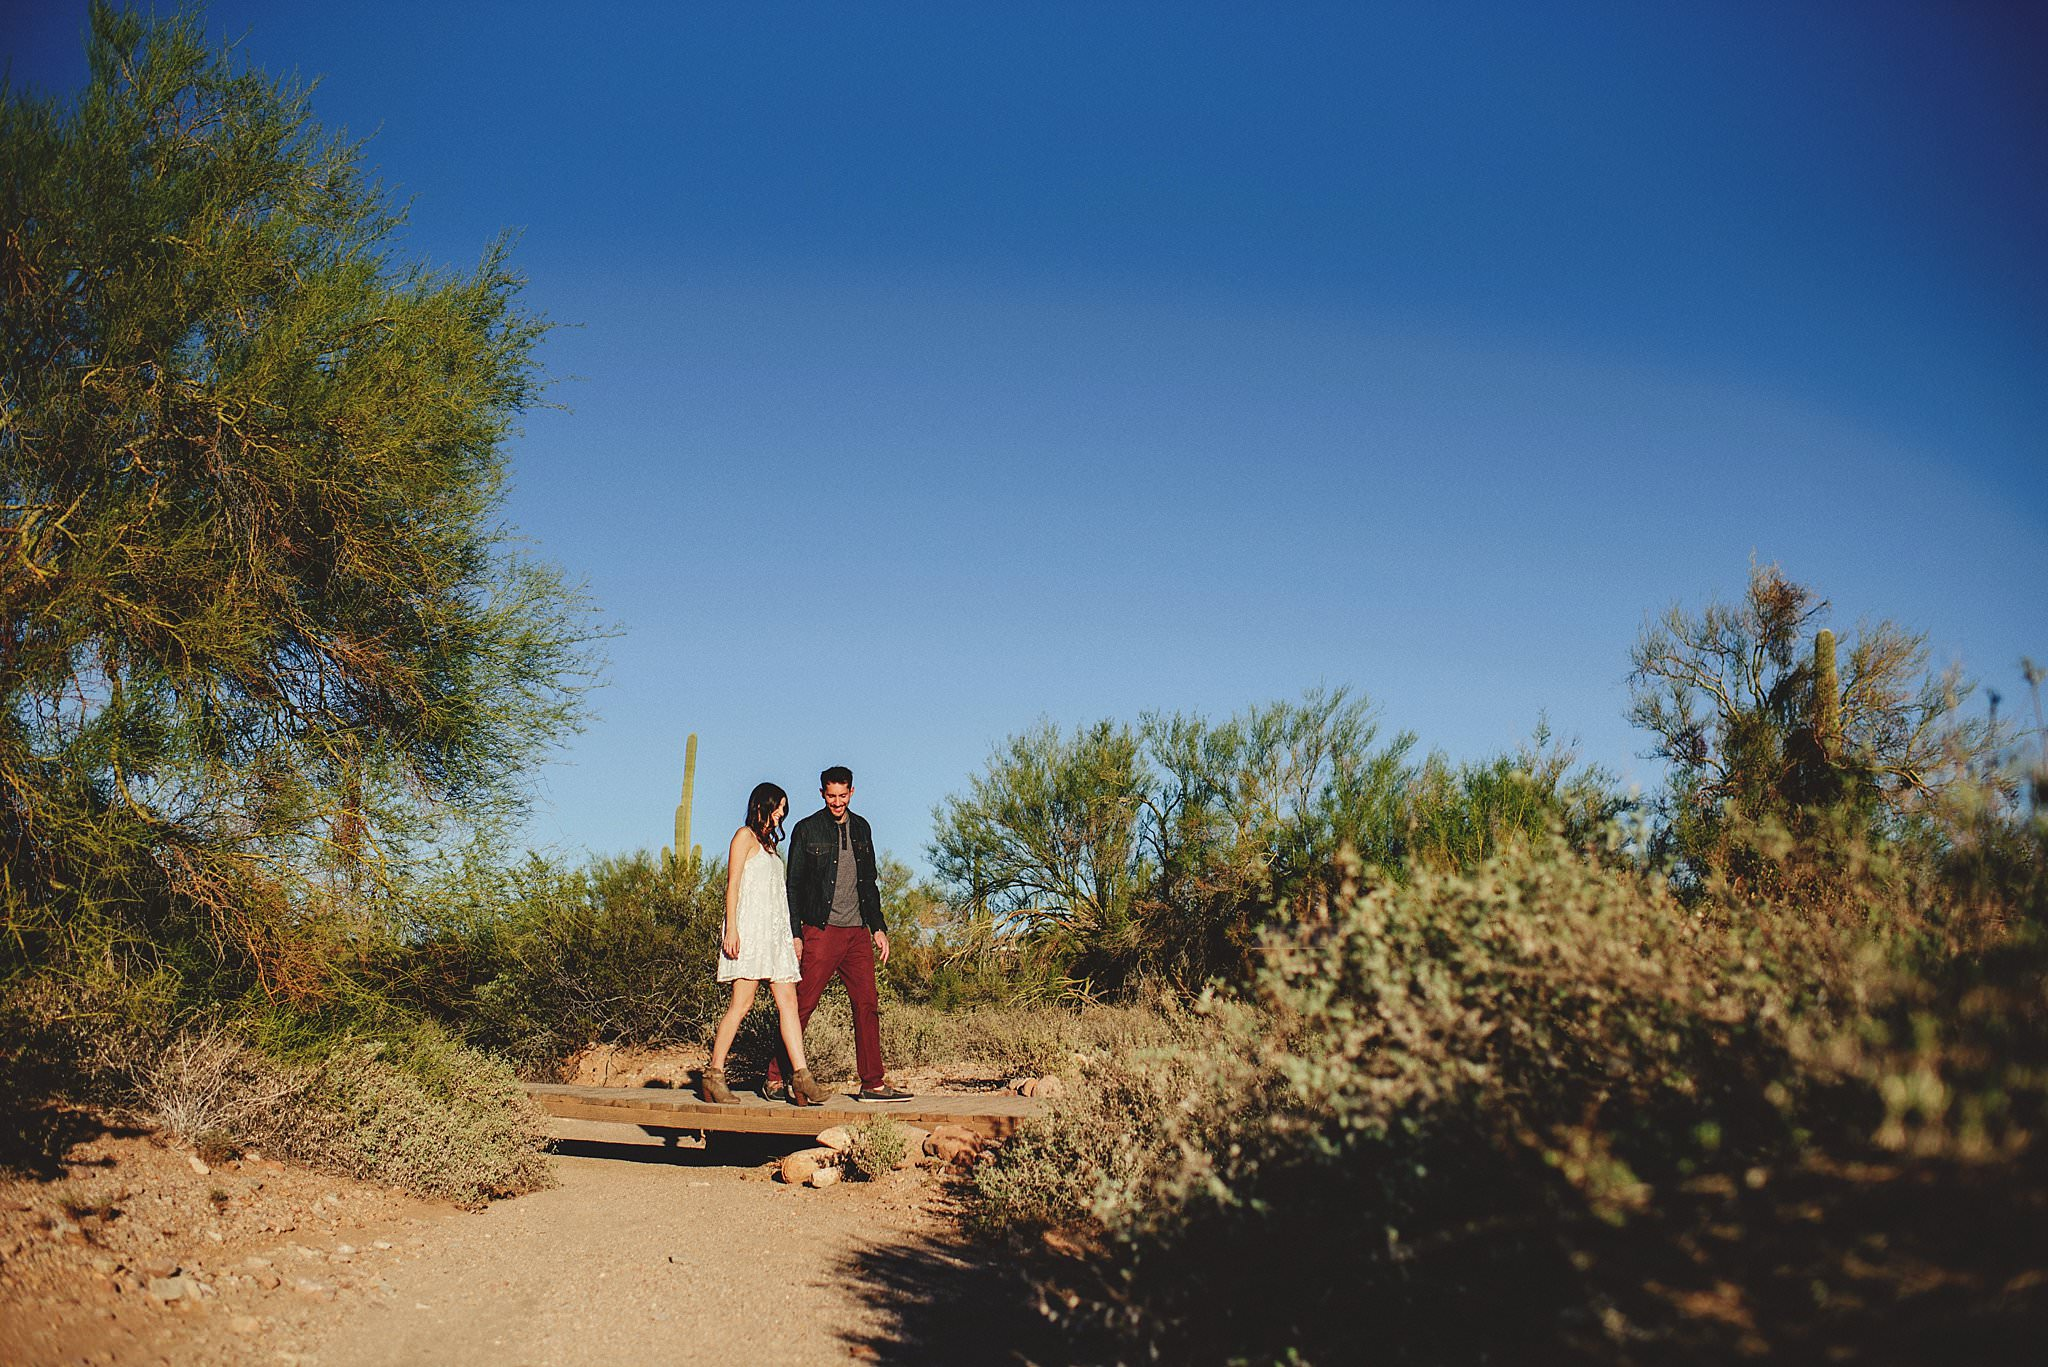 superstition-mountains-desert-engagement-photos-0004.jpg